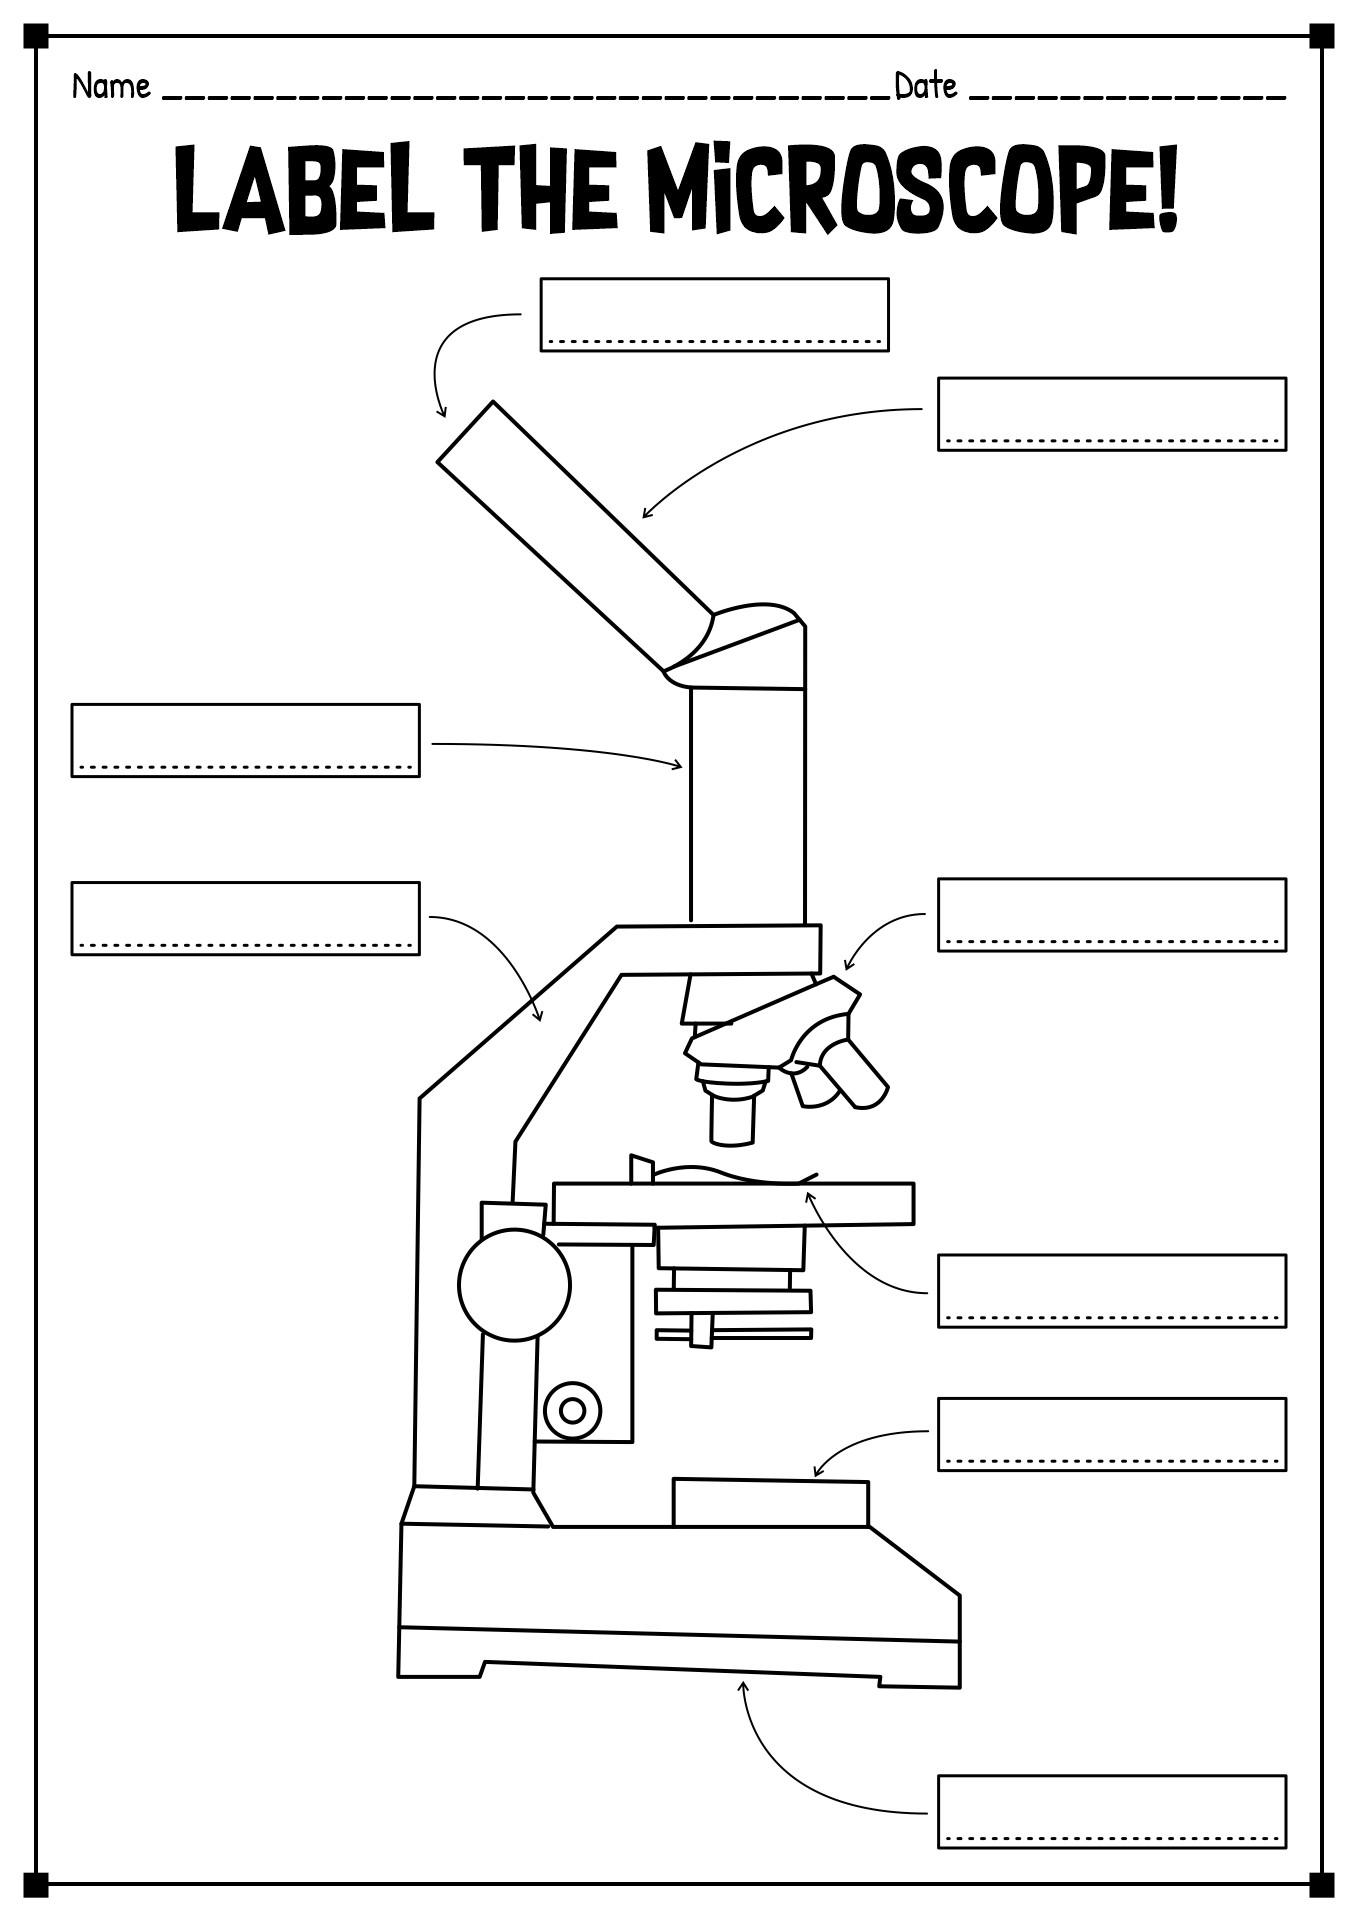 15 Best Images of Printable Microscope Worksheet